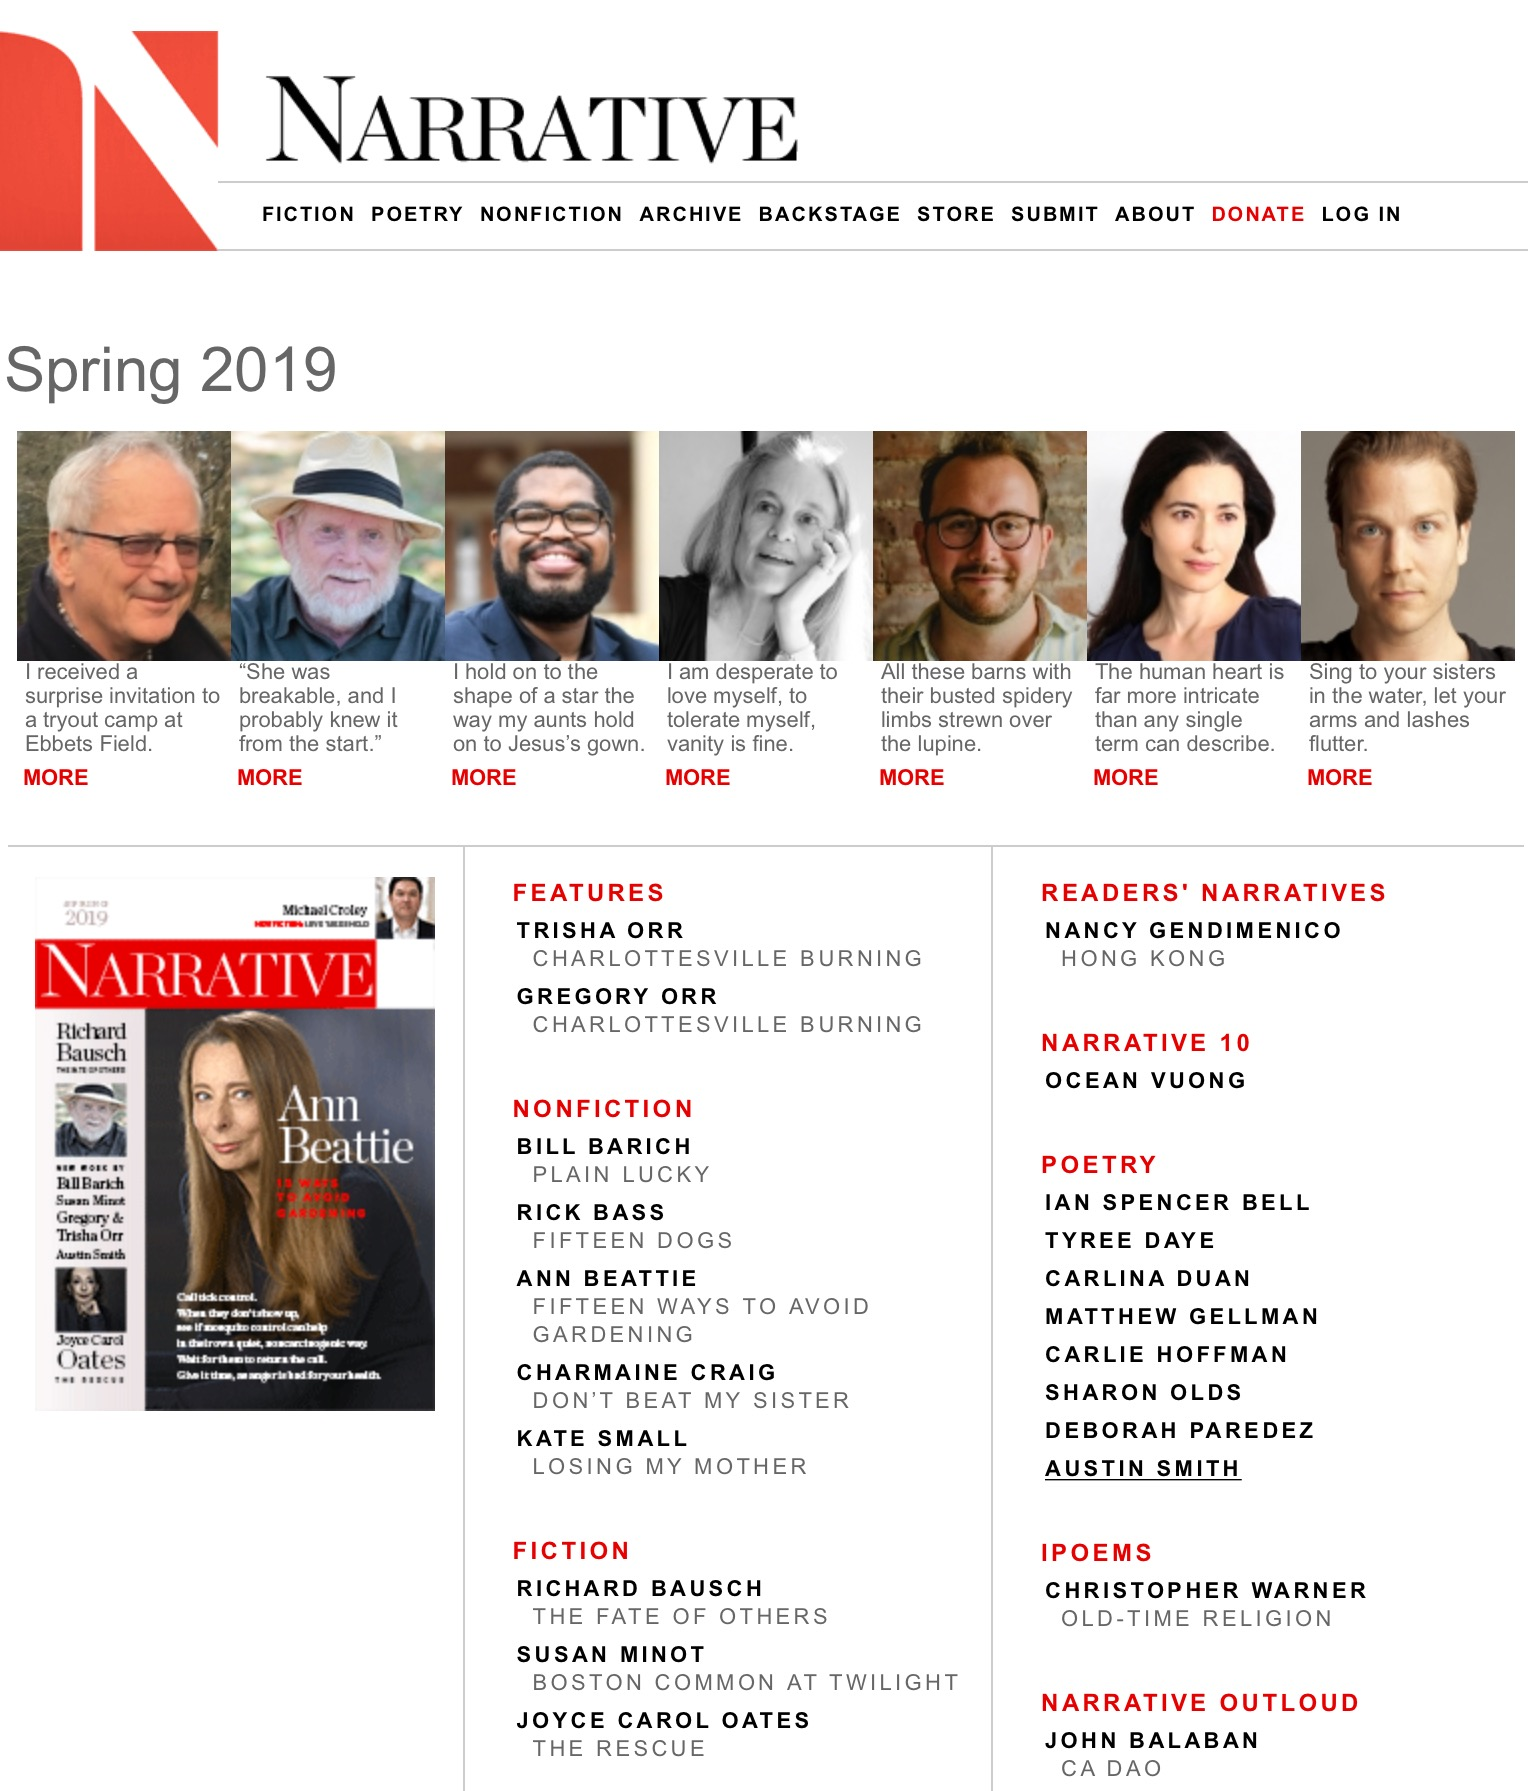 Nancy Gendemencio Narrative Magazine